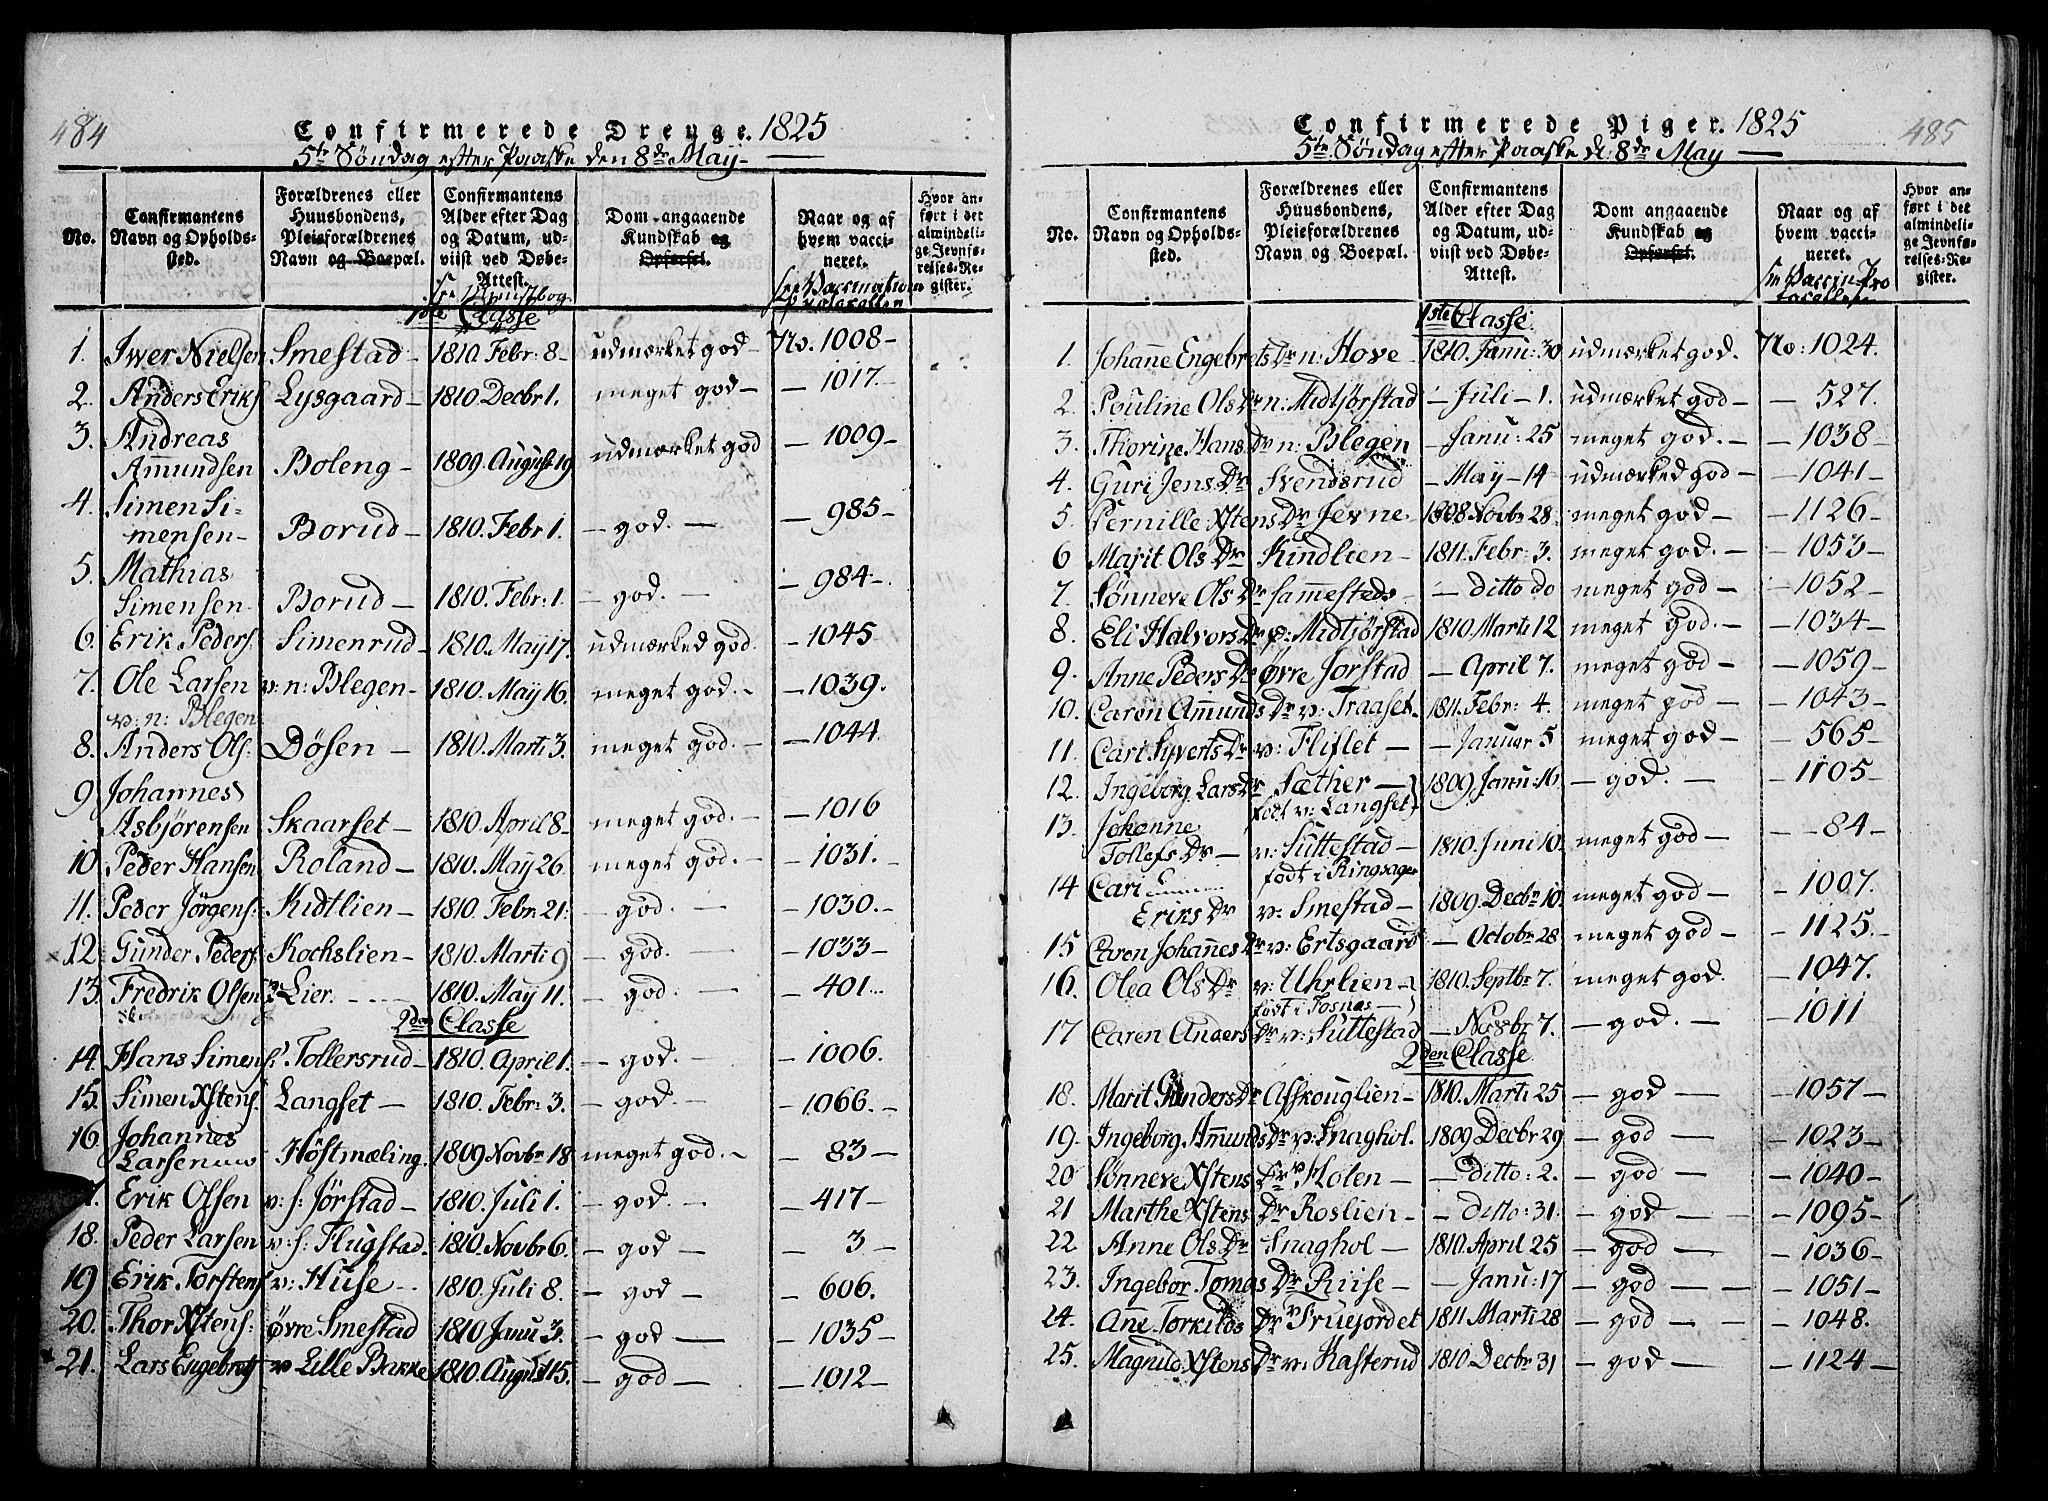 SAH, Fåberg prestekontor, Ministerialbok nr. 3, 1818-1833, s. 484-485